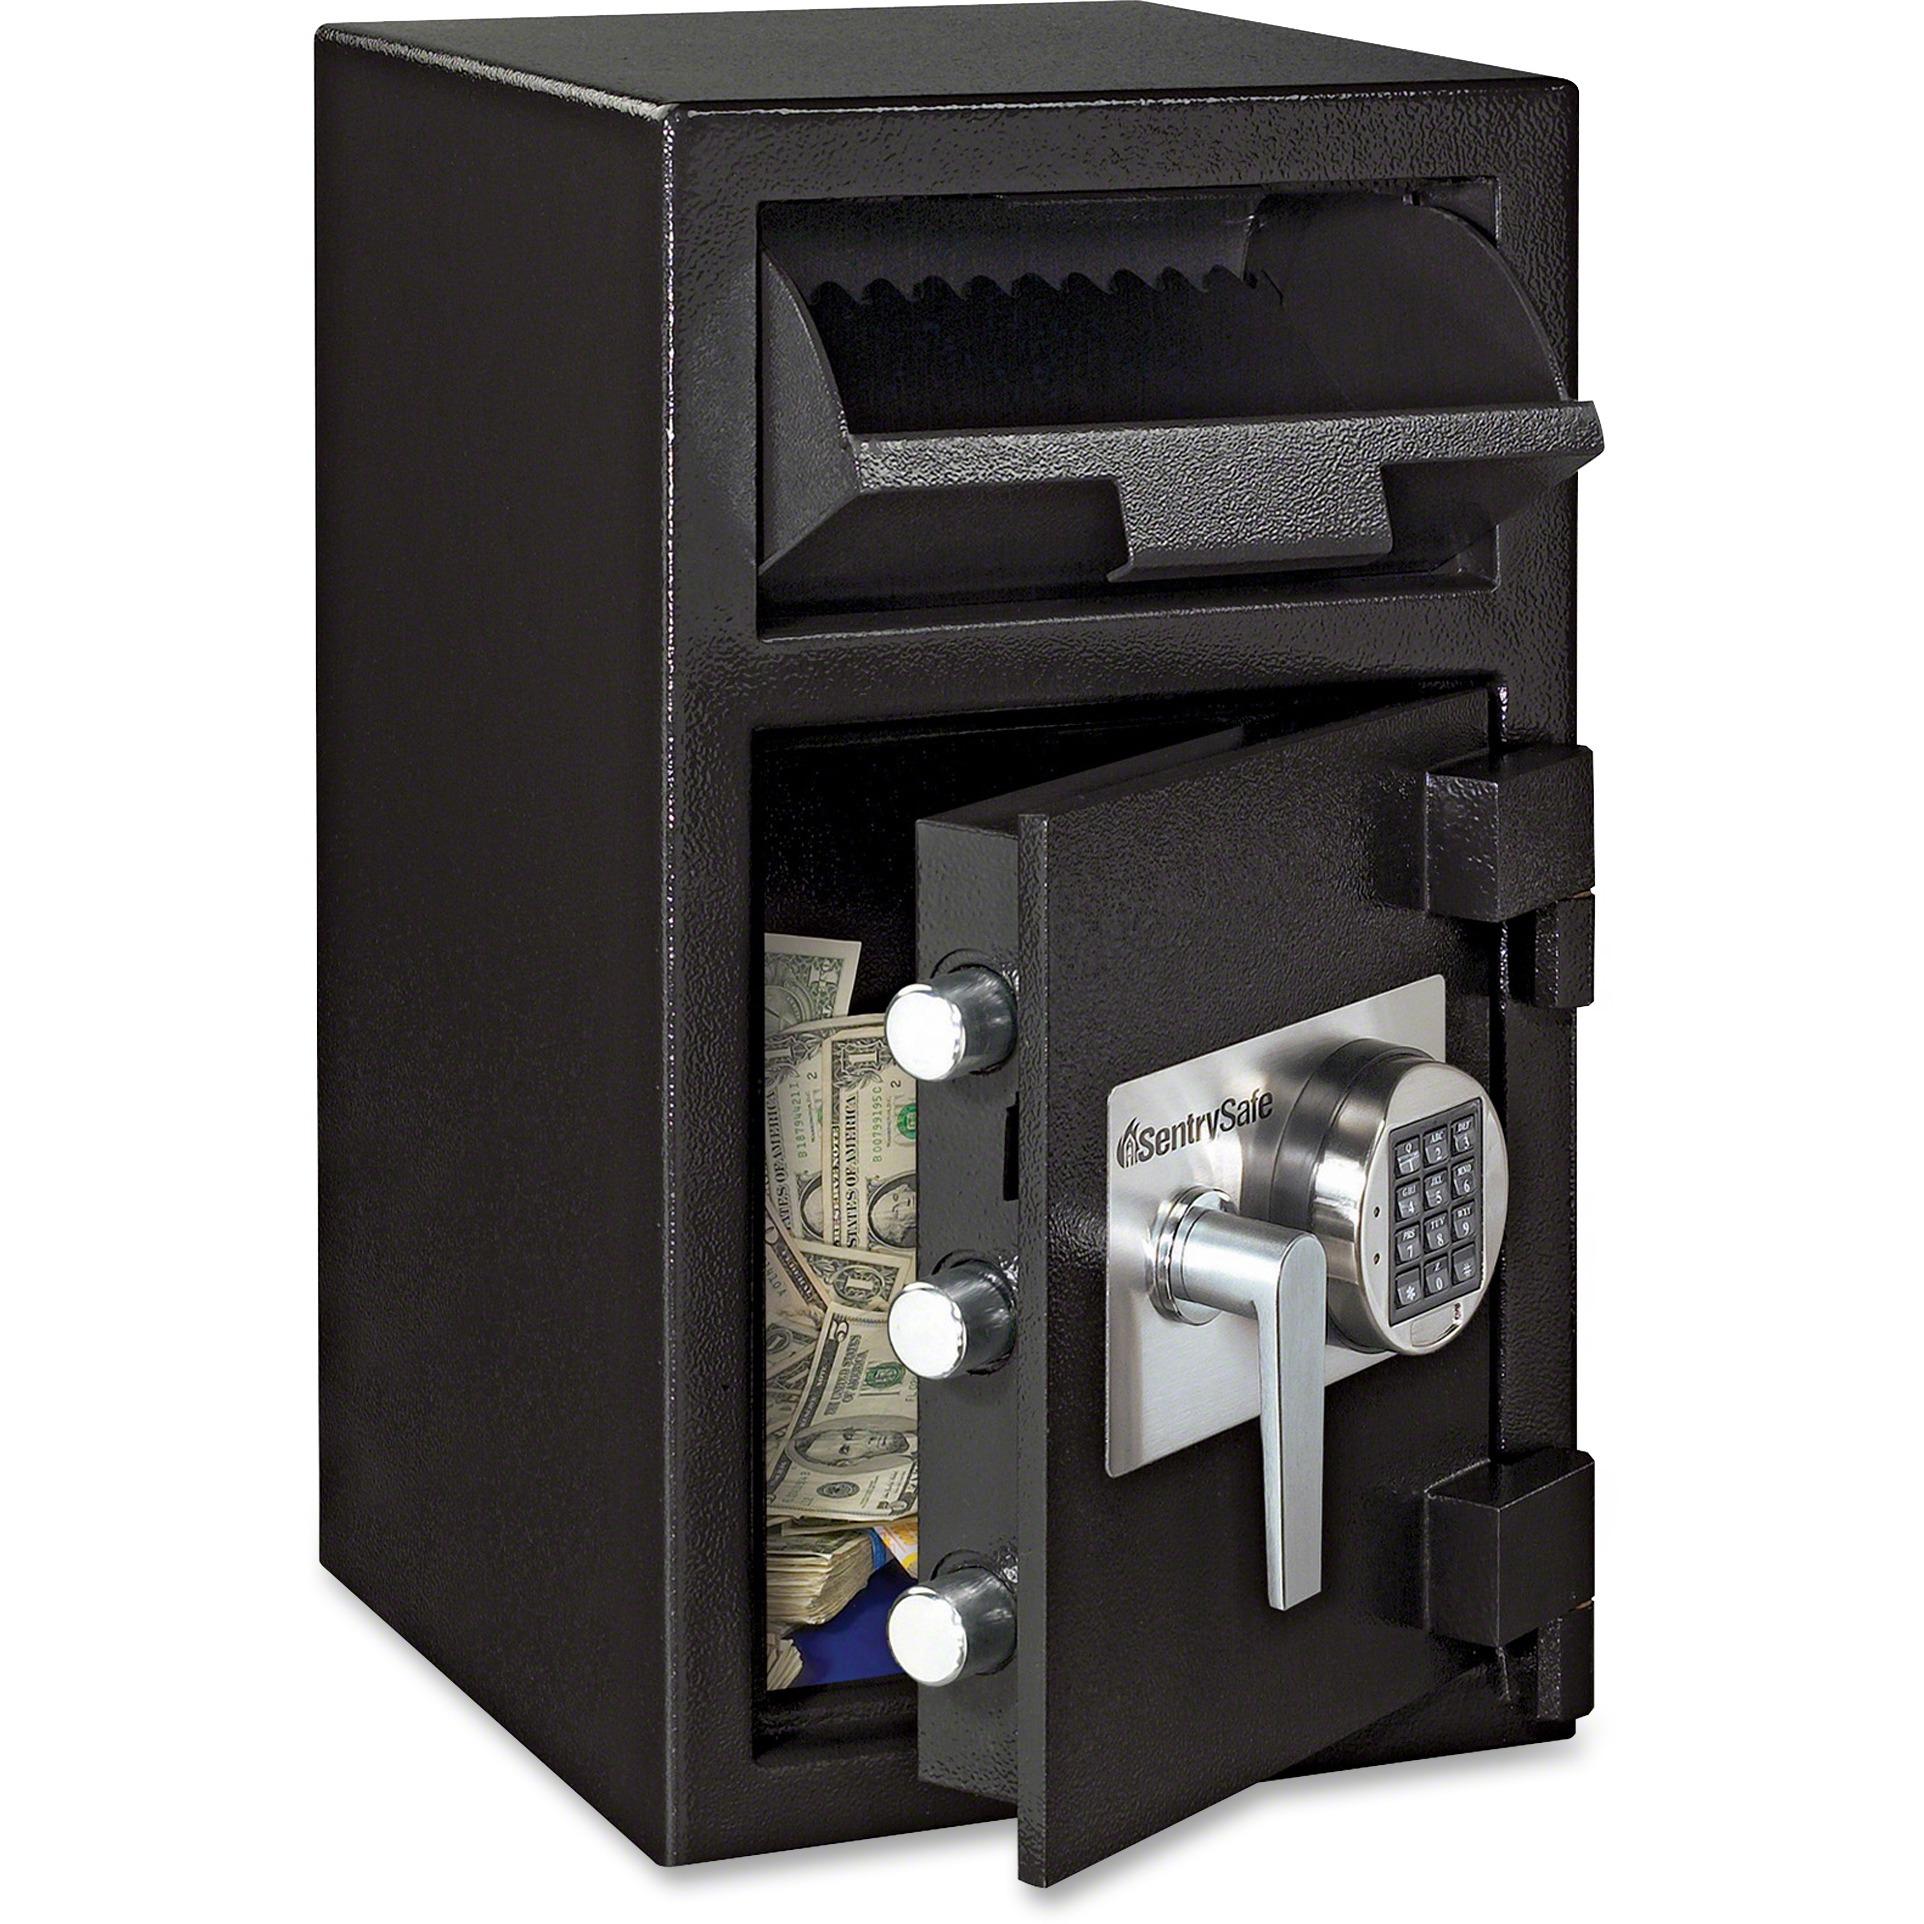 SentrySafe DH109E Depository Security Safe, 1.3 cu ft